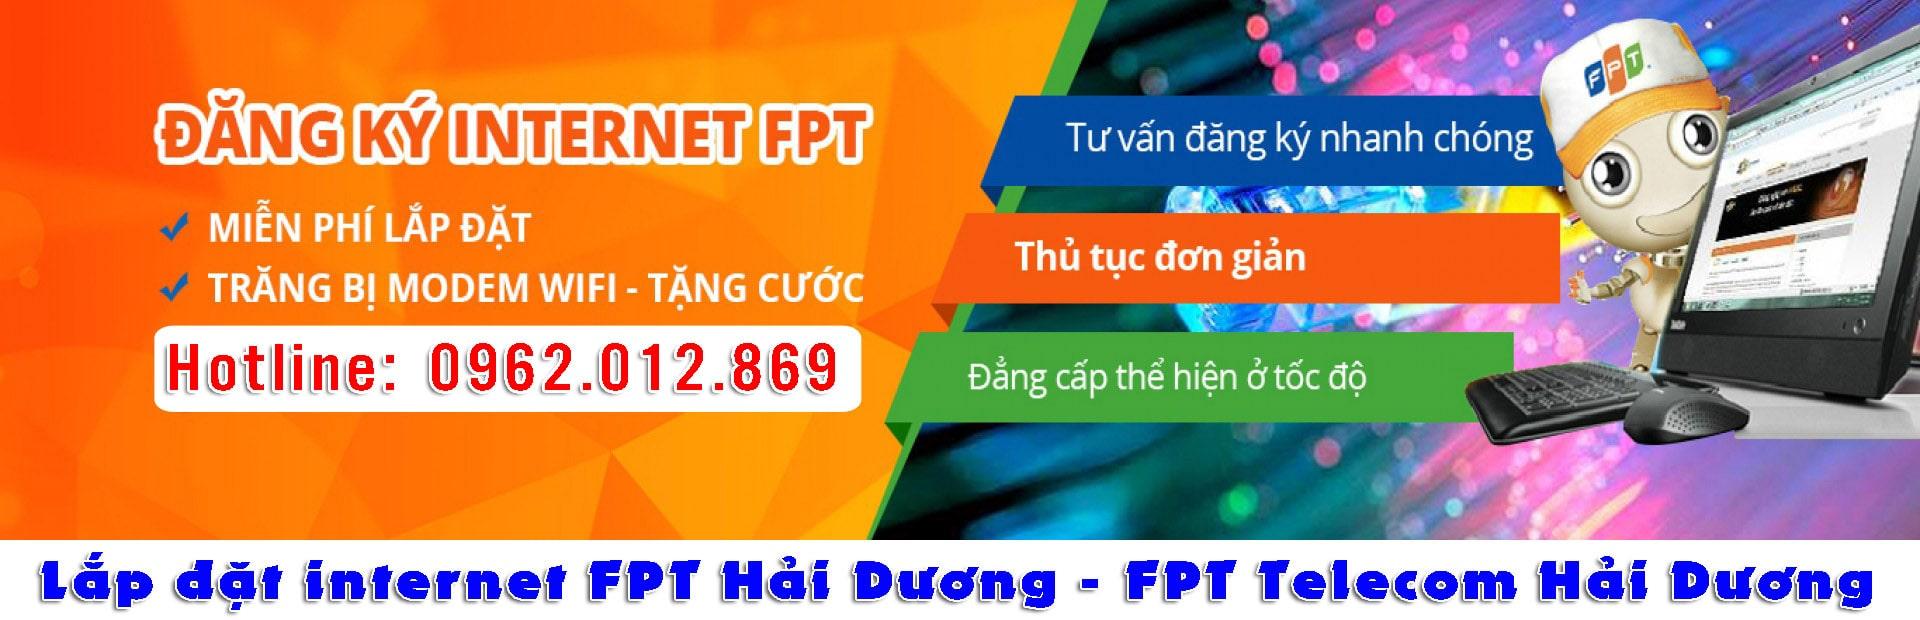 banner-lap-dat-internet-fpt-hai-duong-min